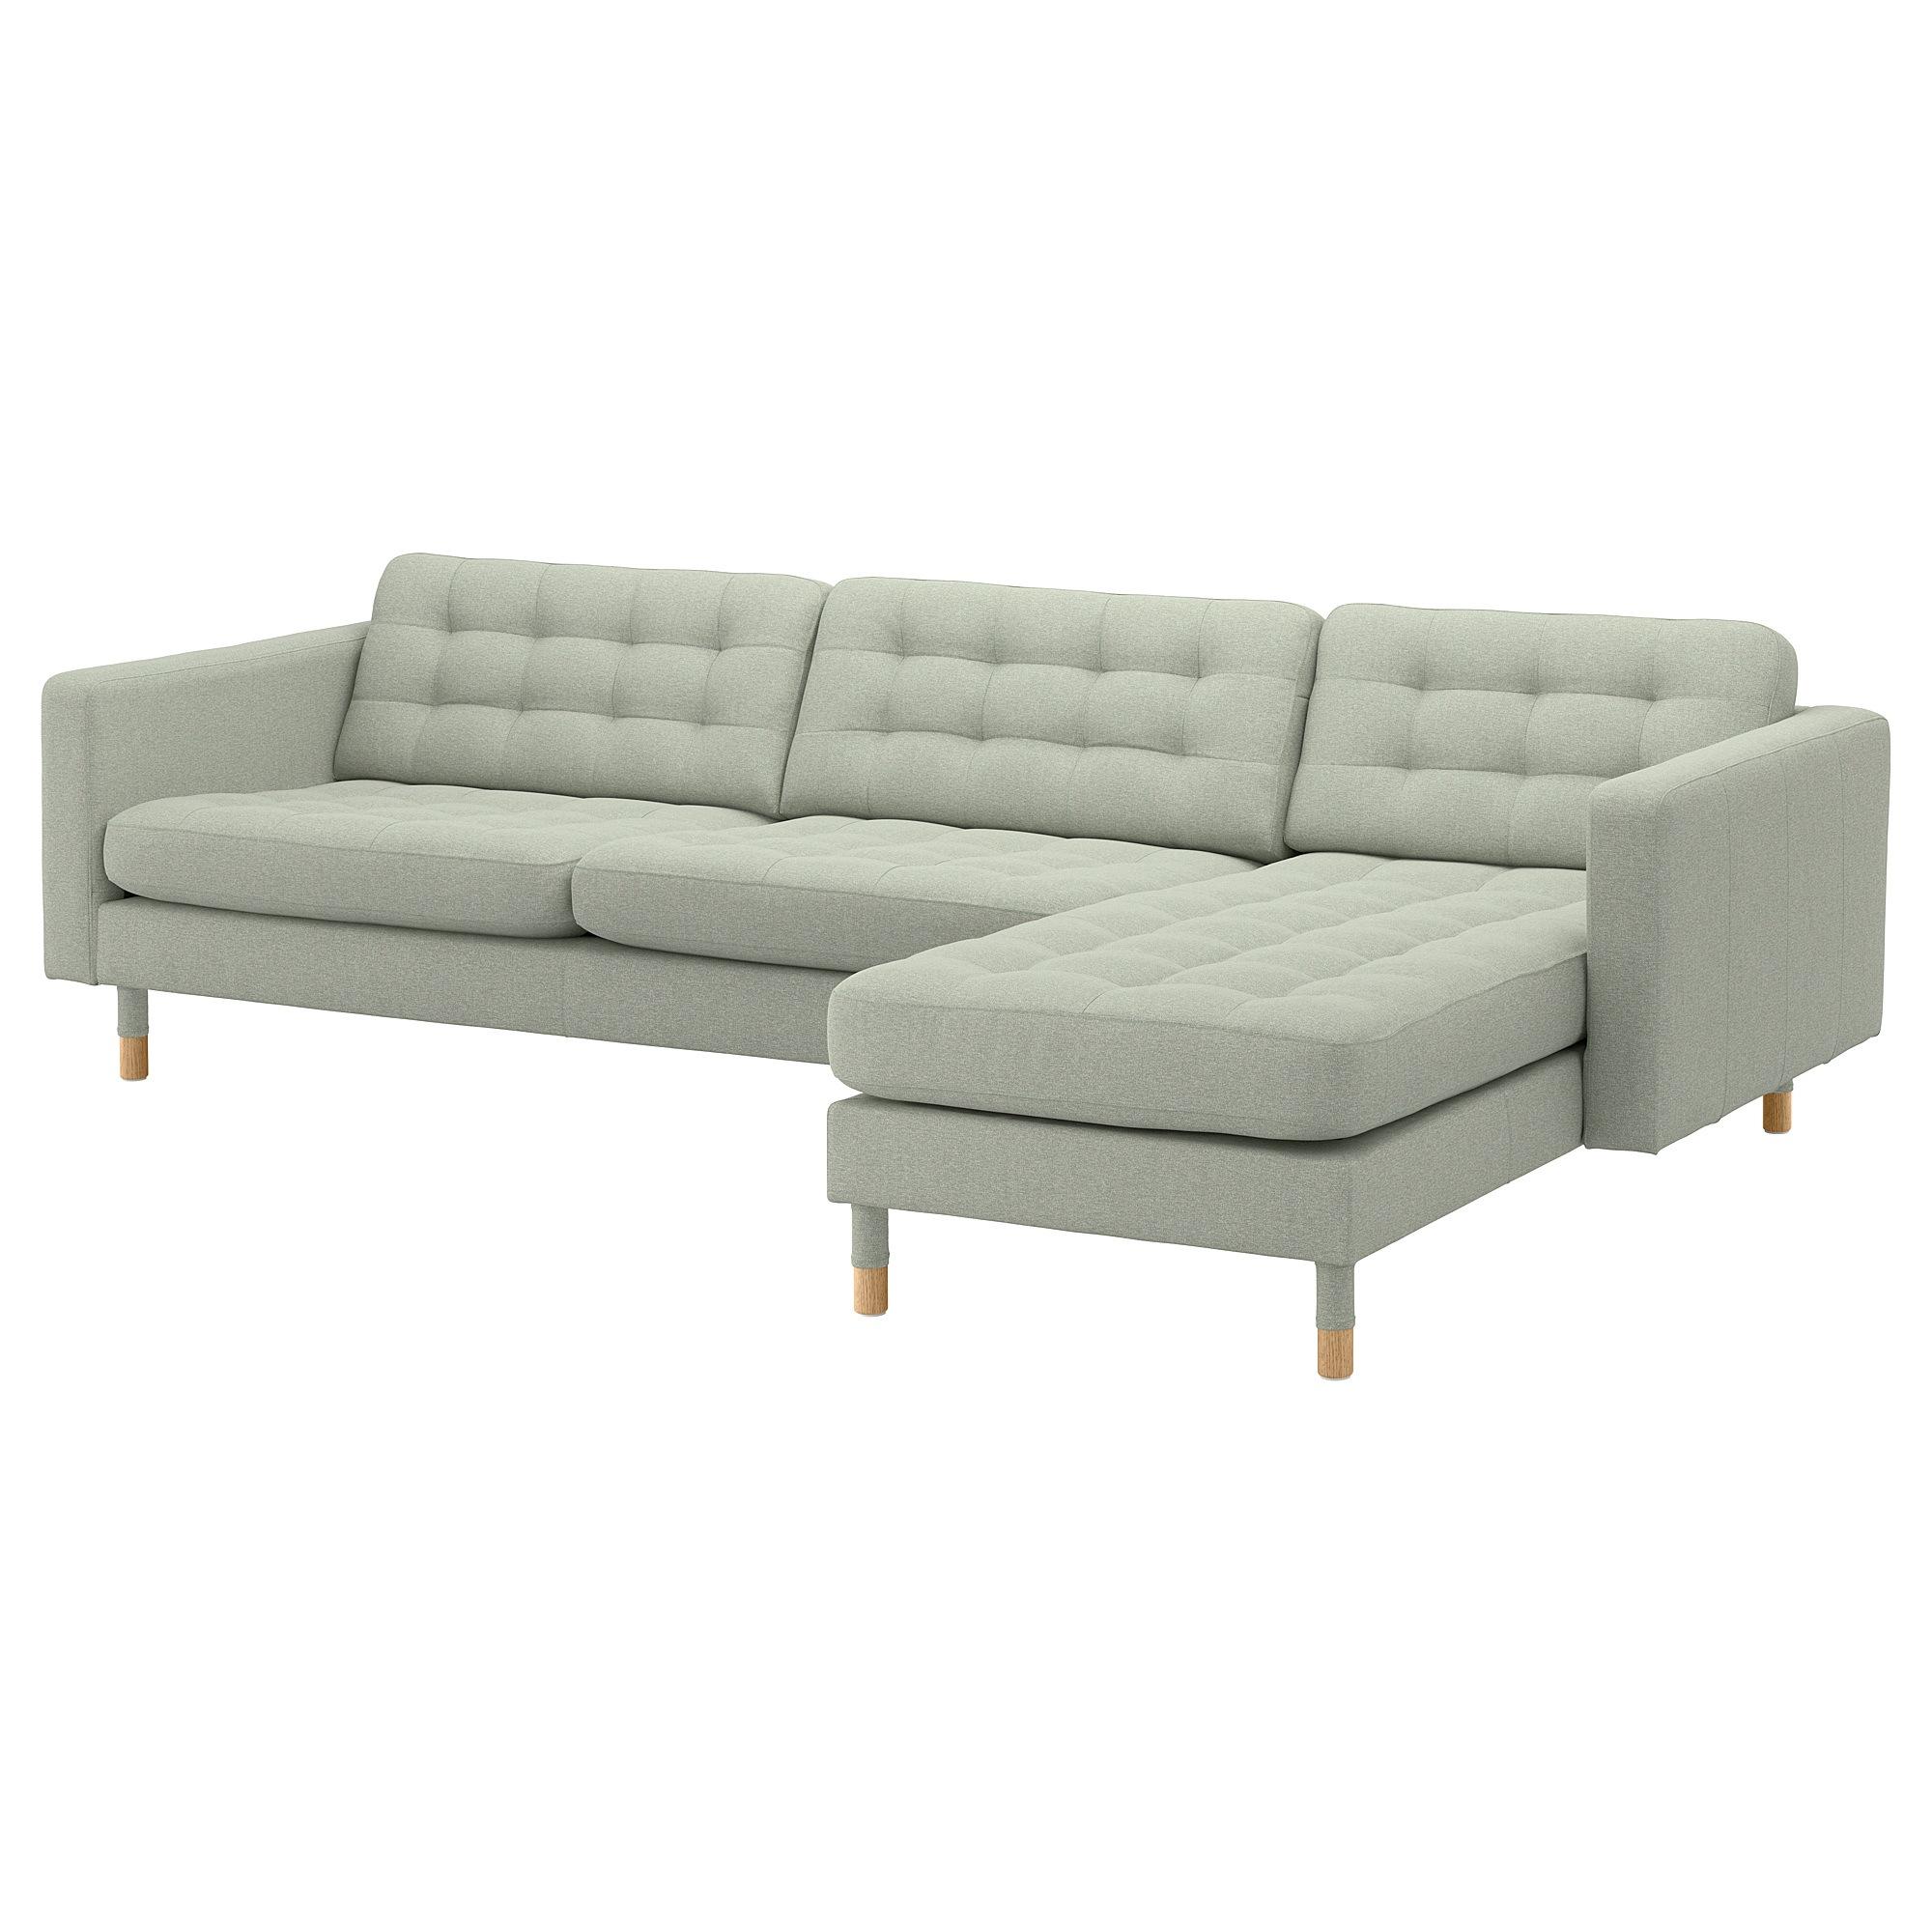 Landskrona 4er Sofa Mit Recamiere Gunnared Hellgrun Holz Ikea Osterreich 3er Sofa Sofa Stoff Modulares Ecksofa